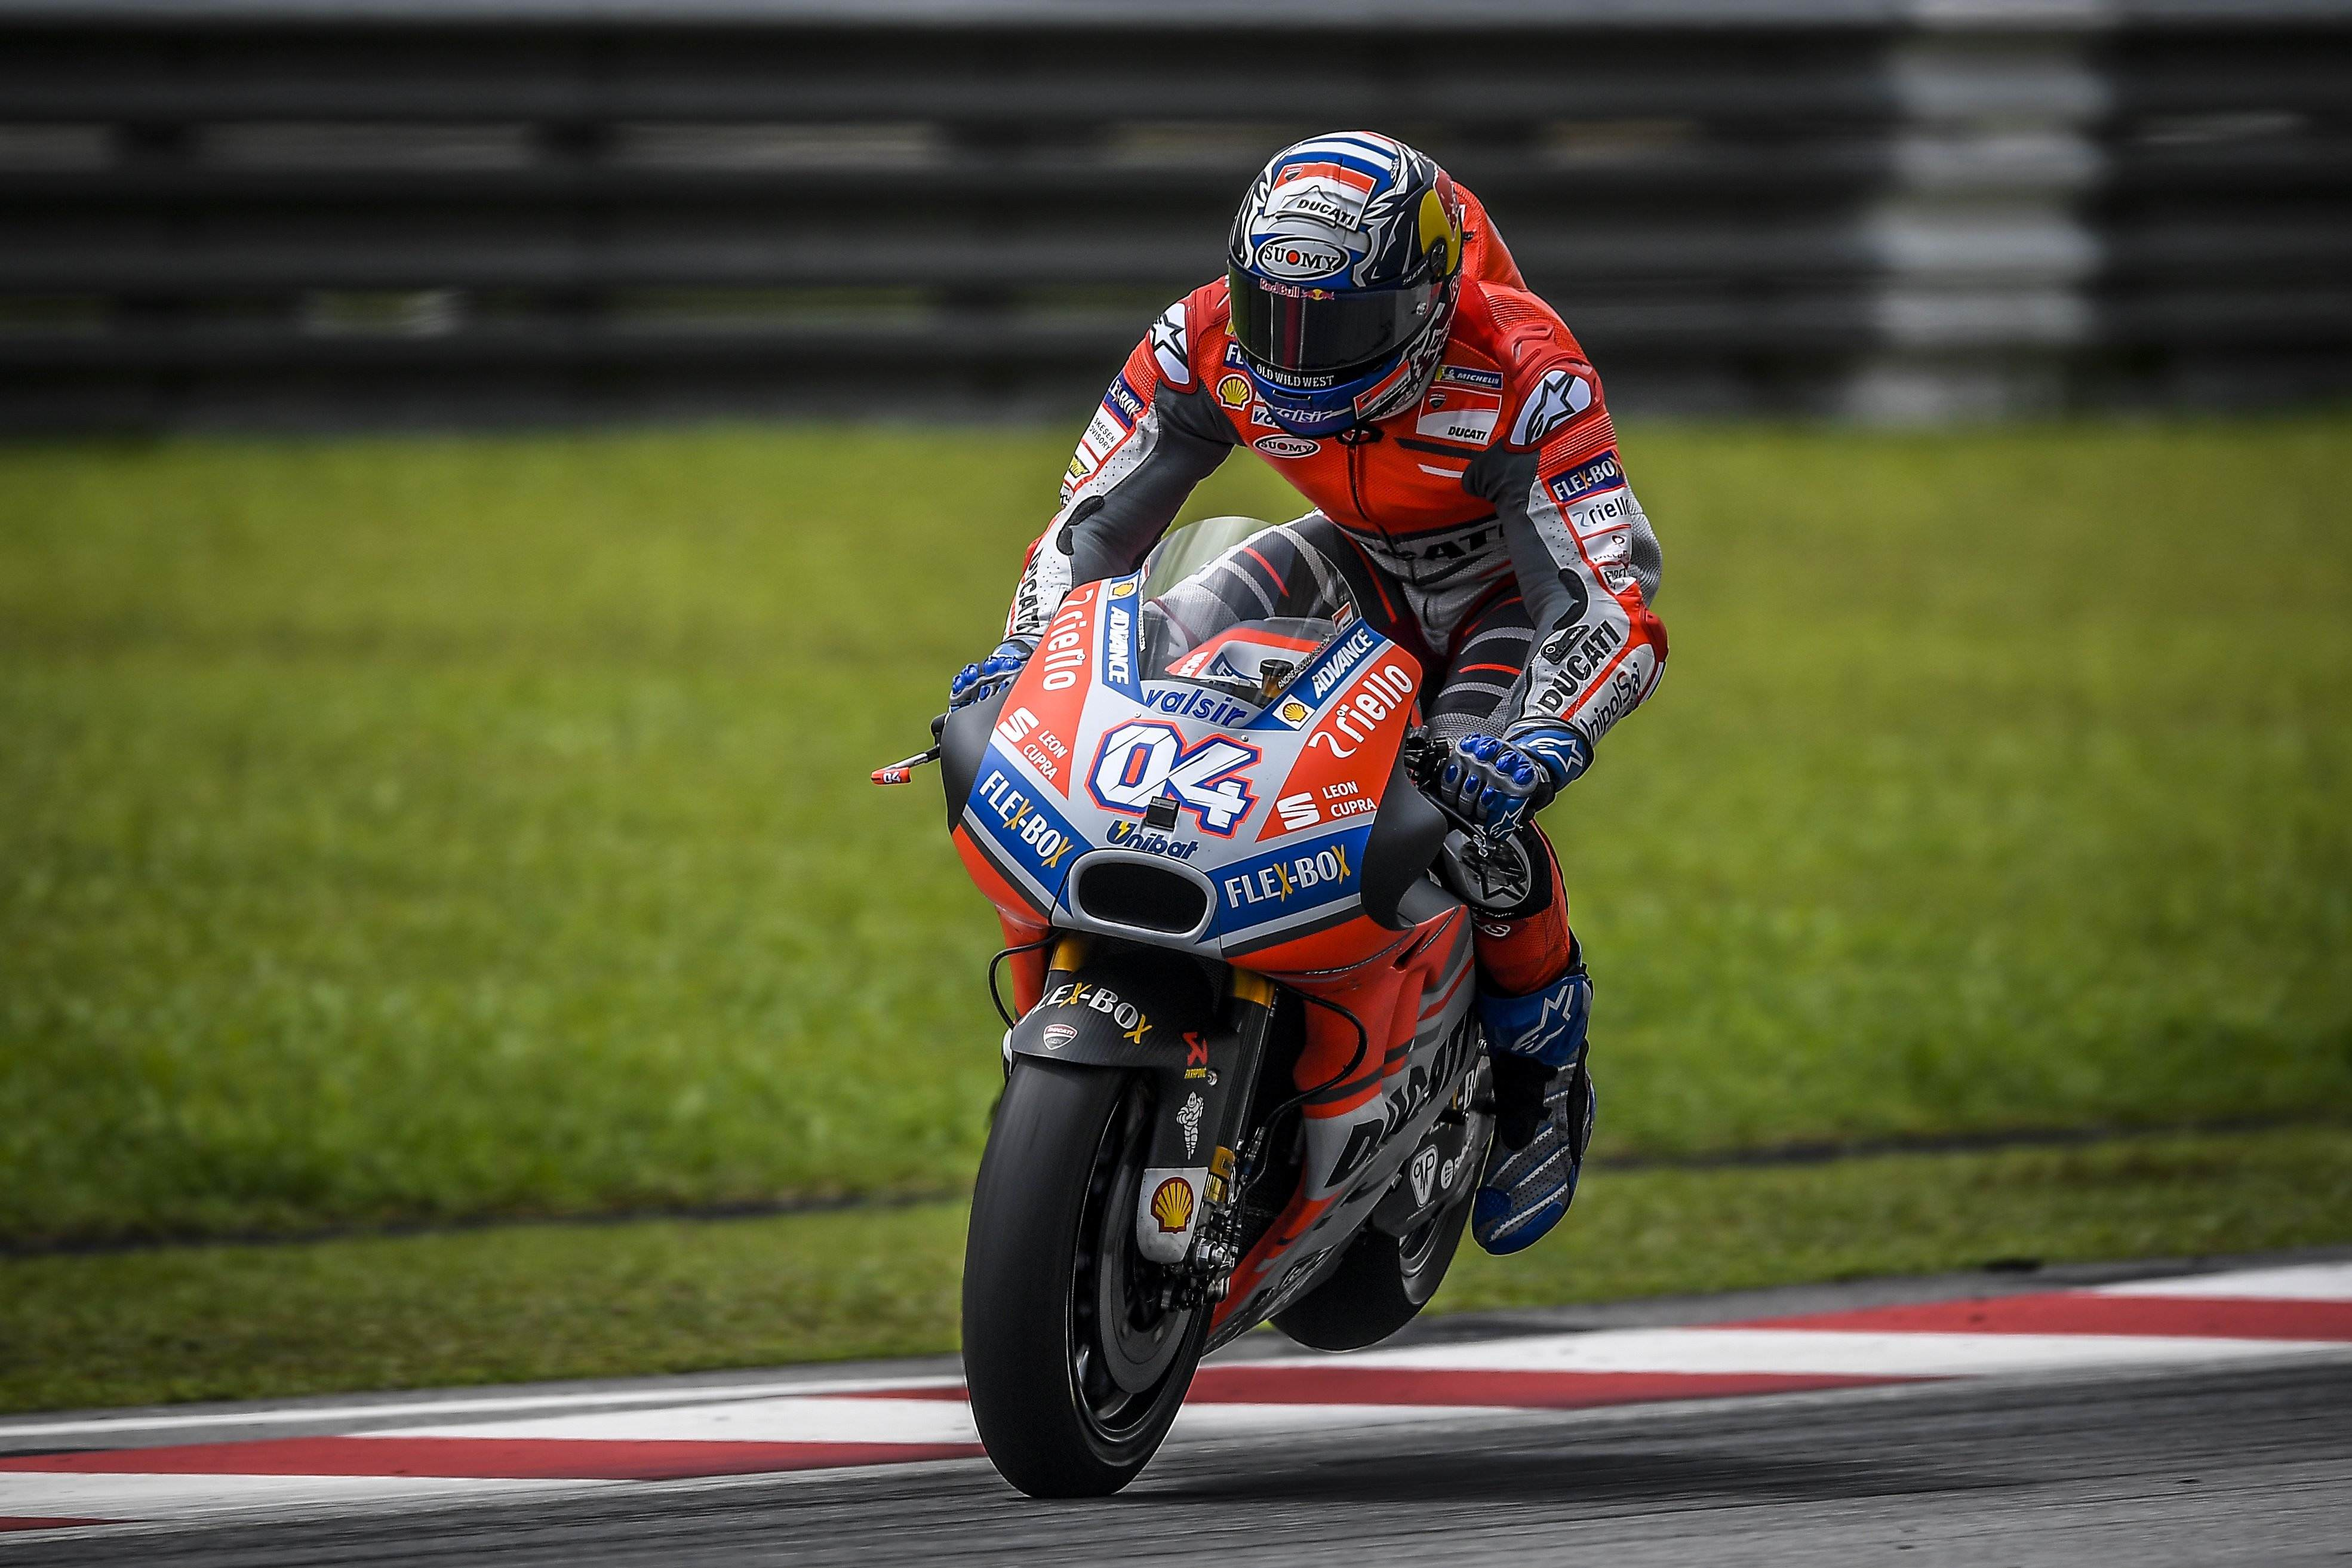 Mini Cup Race Car >> Ducati, best bike of the Sepang test | FormulaRapida.net